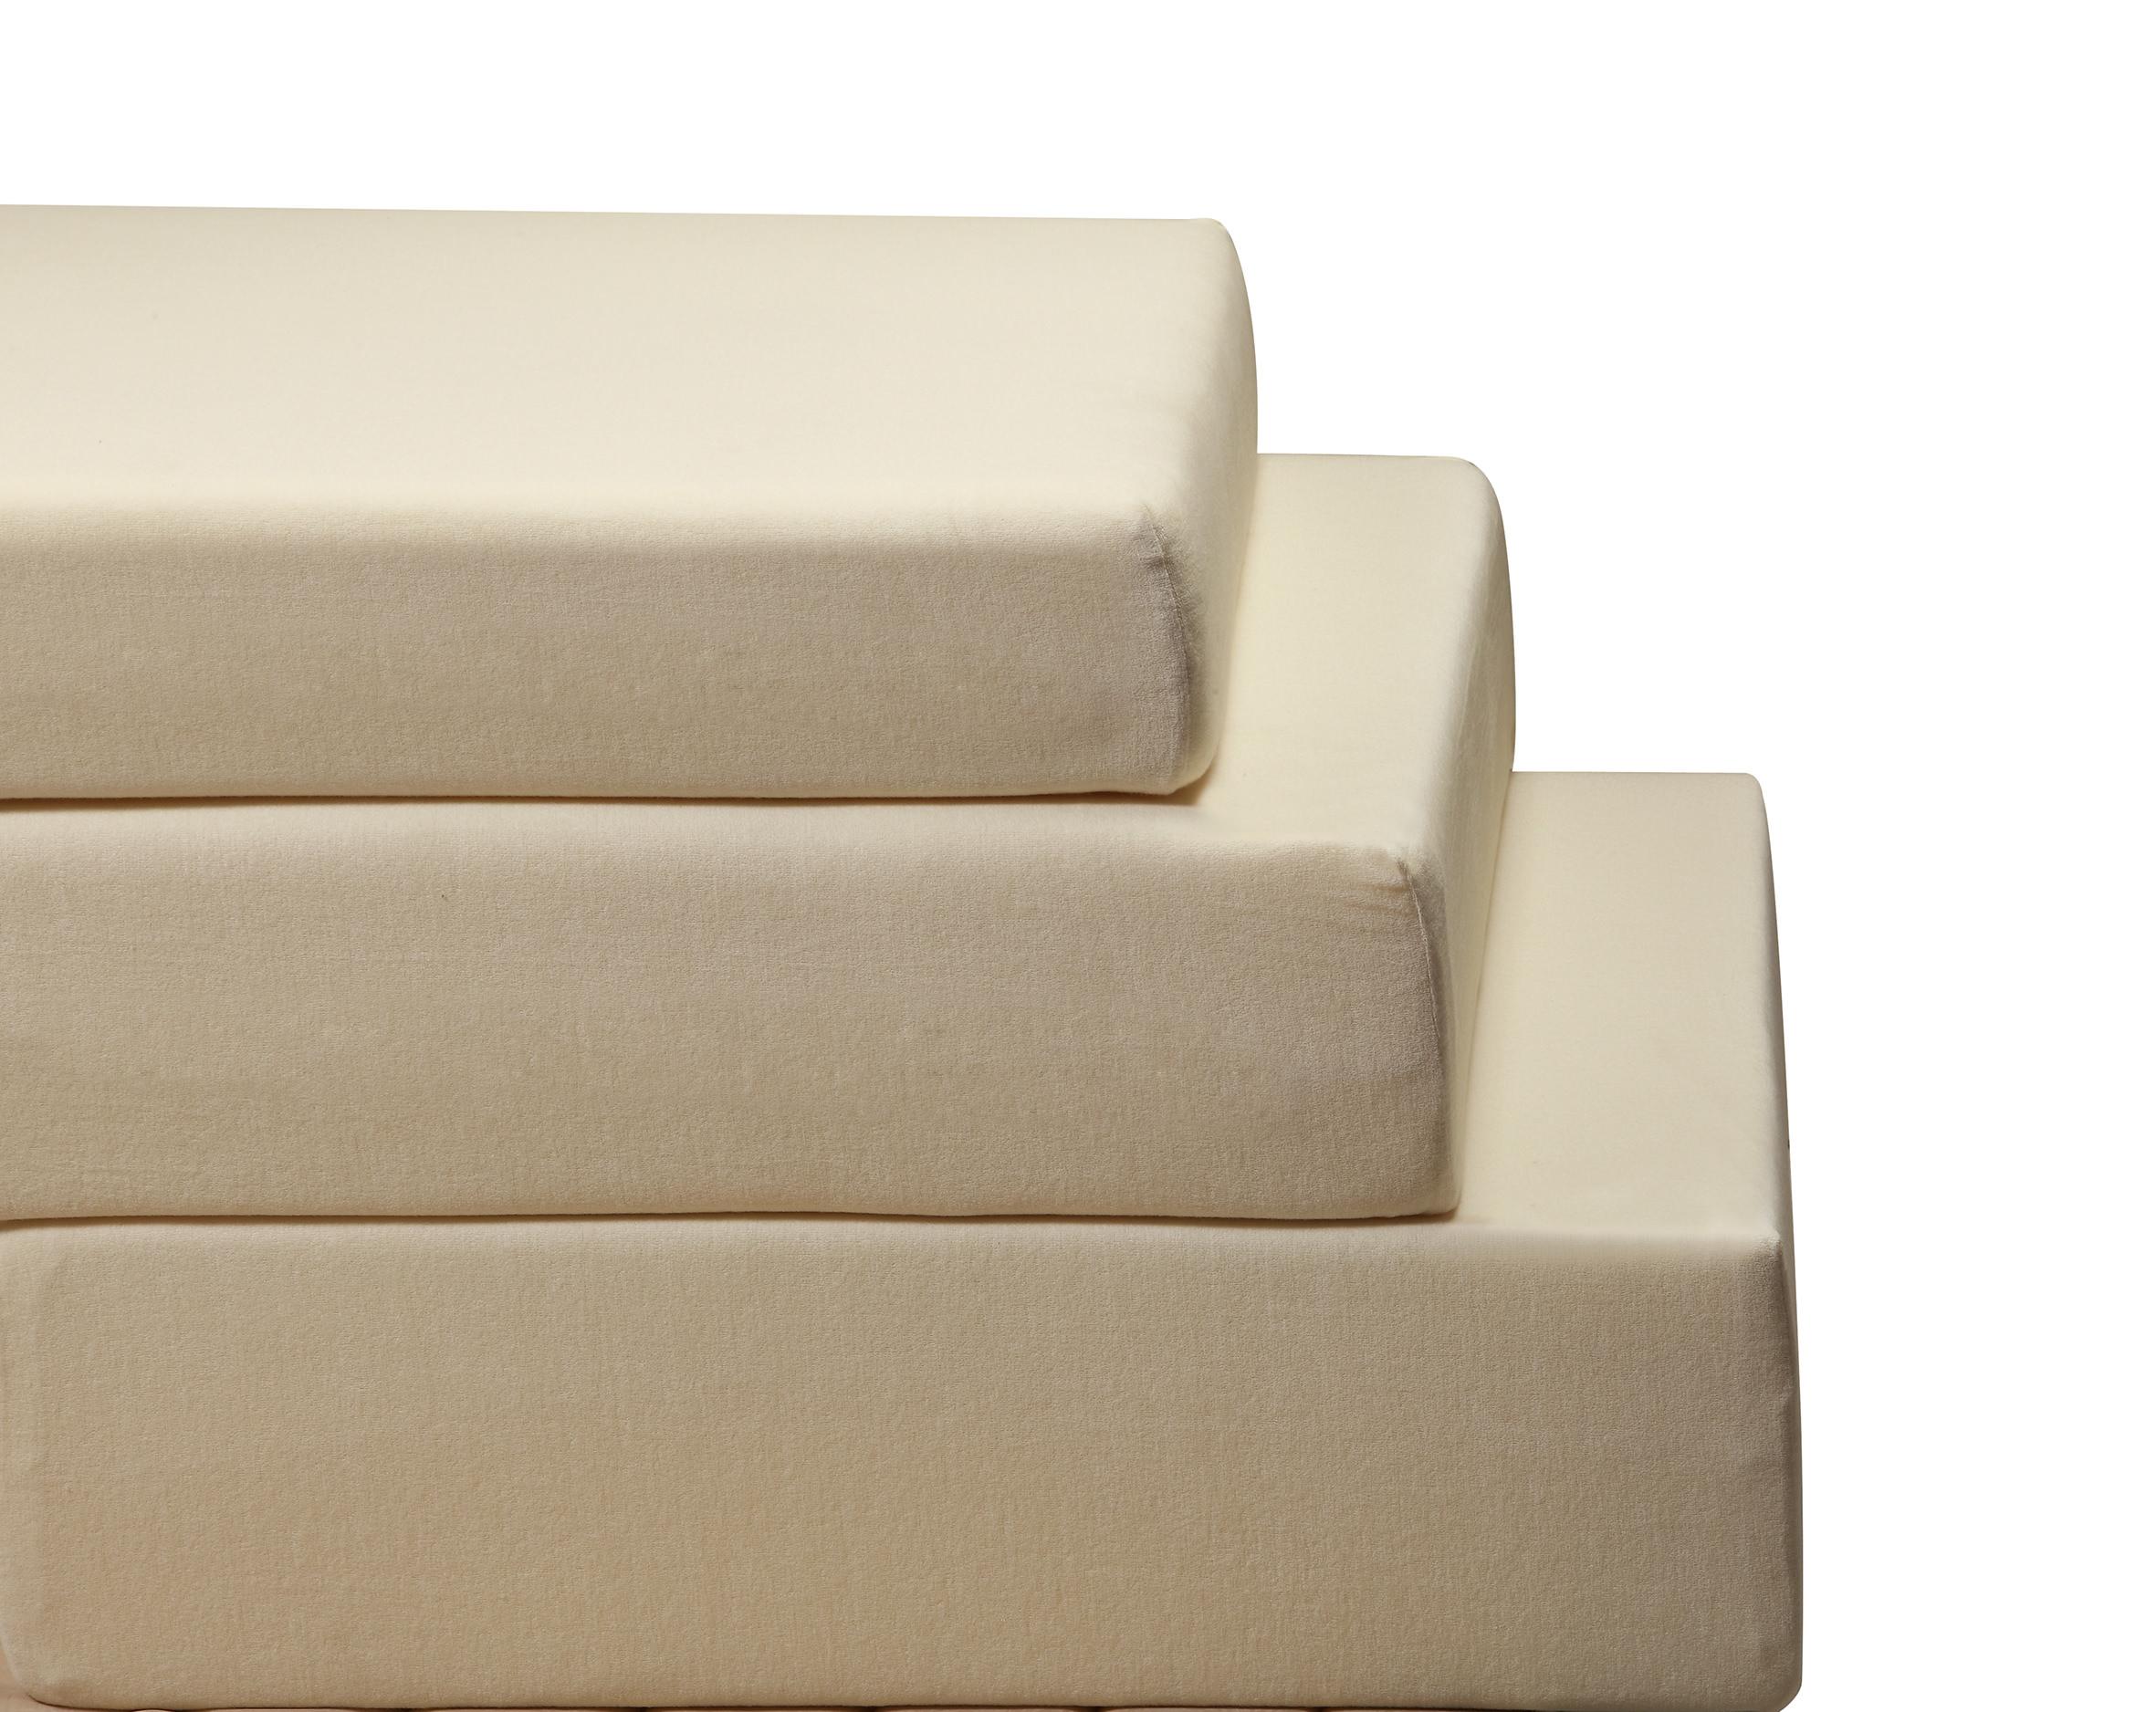 6 Inch Memory Foam Mattress By Poundex